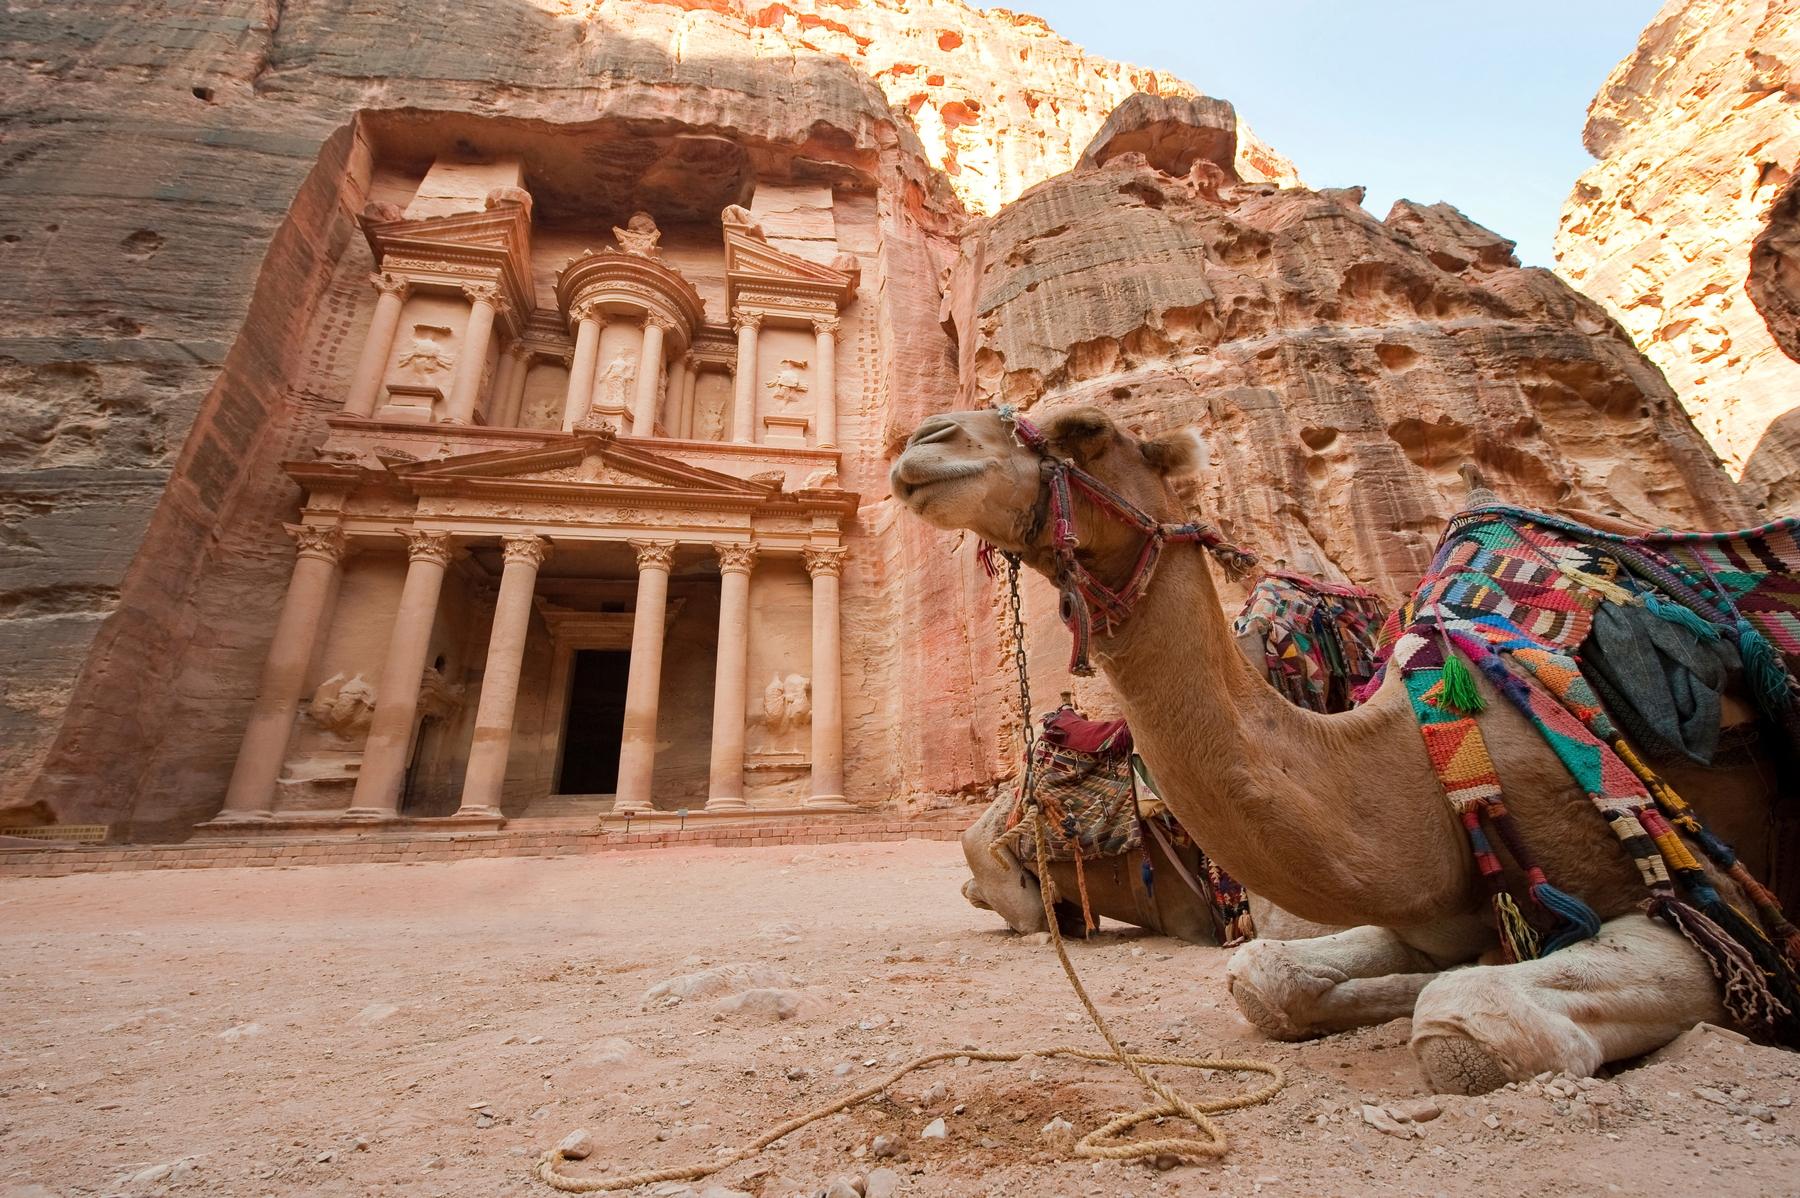 World's oldest cities: Petra